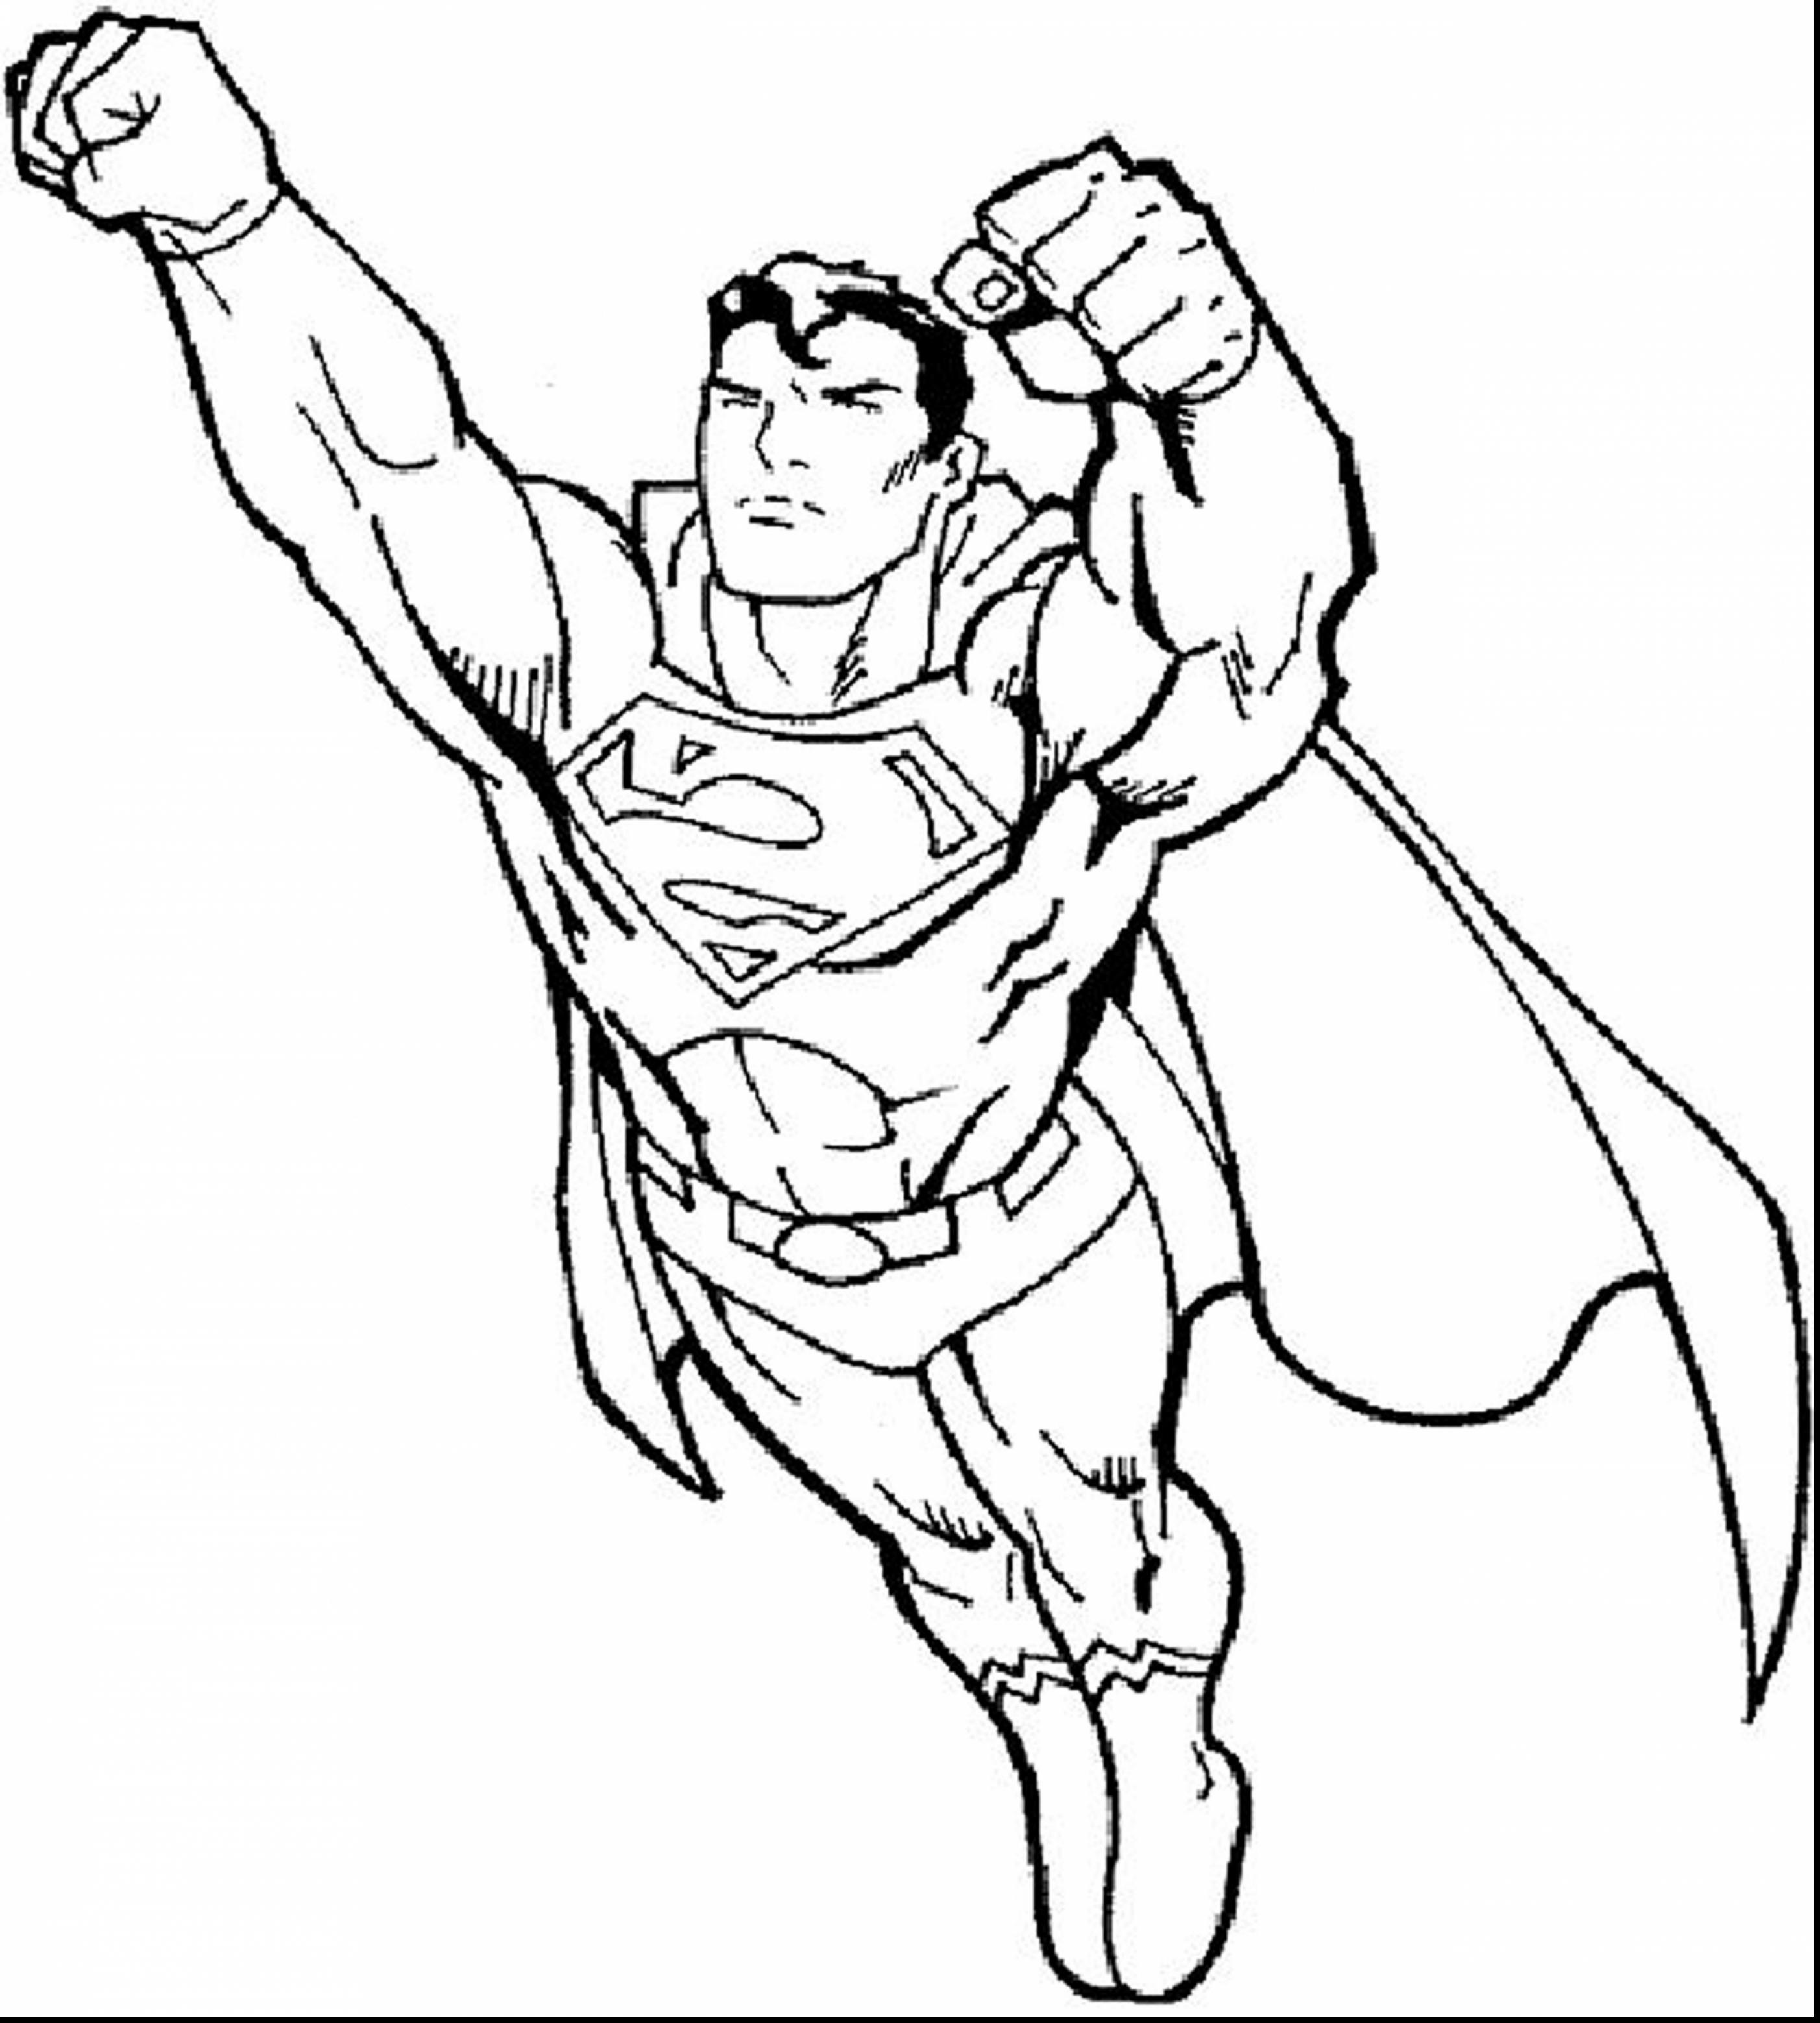 Batman Vs Superman Color Pages Batman Vs Superman Coloring Pages Download Free Coloring Book